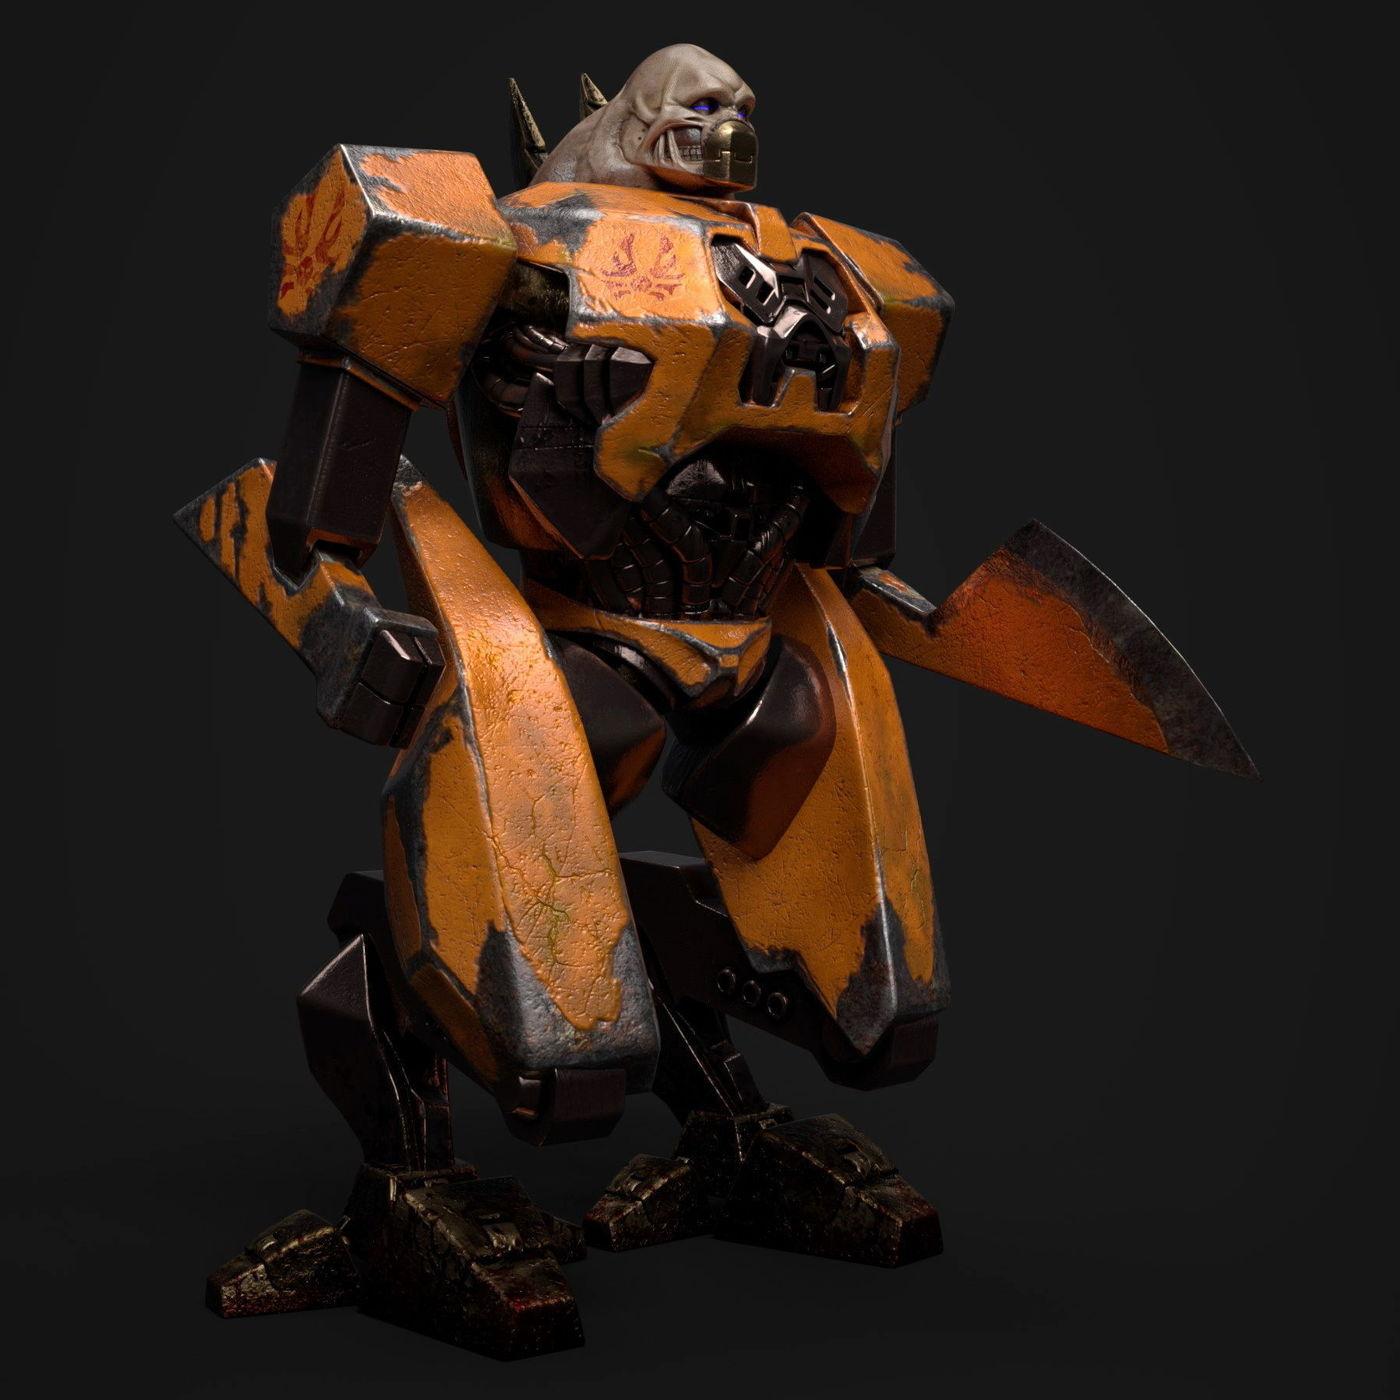 Tankjr remake from Quake 3 Arena | CGTrader